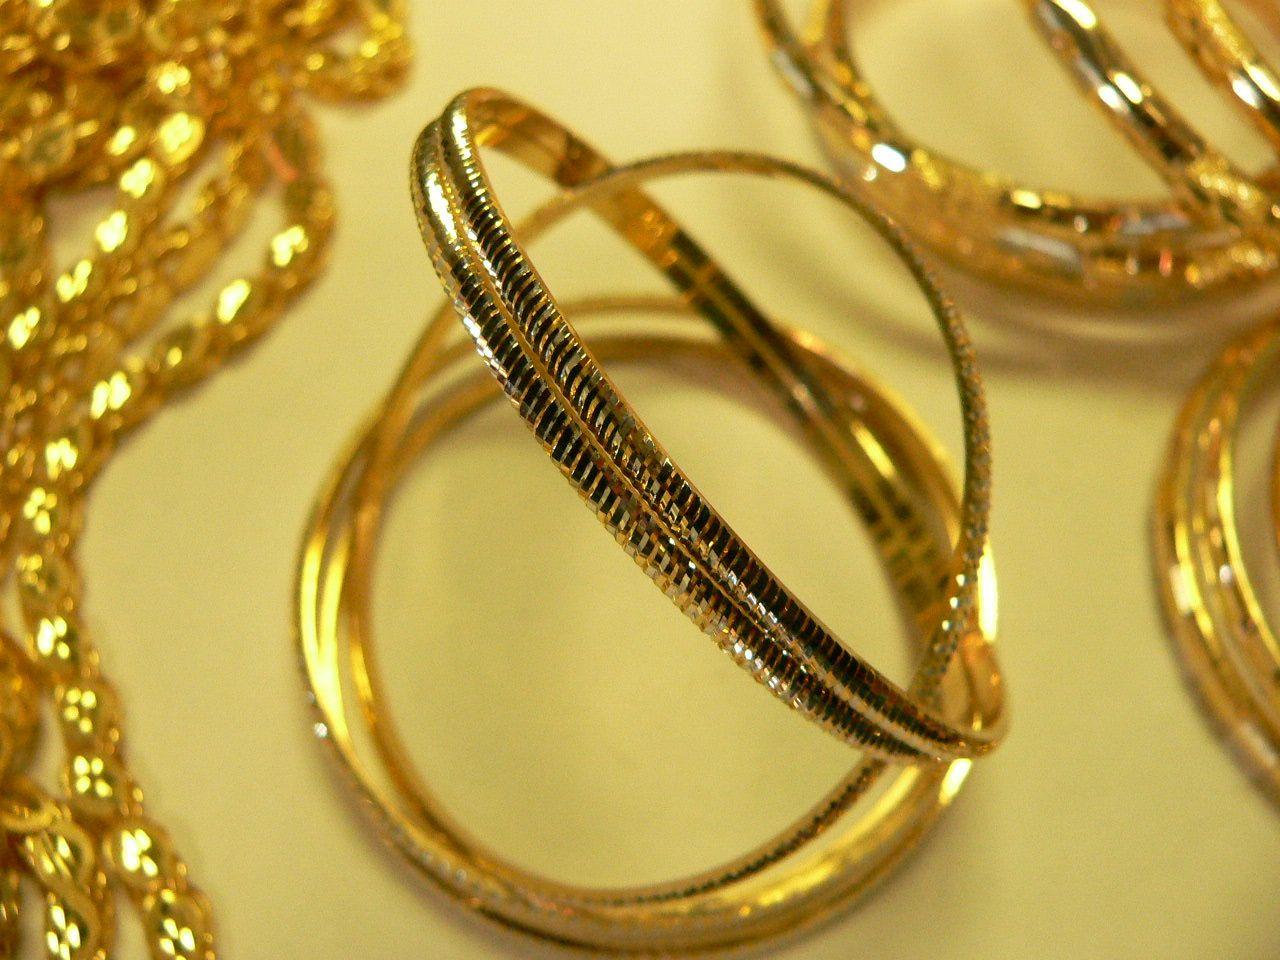 New Bangles in 21 karat gold now at NJ Diamonds Jewelry Pinterest